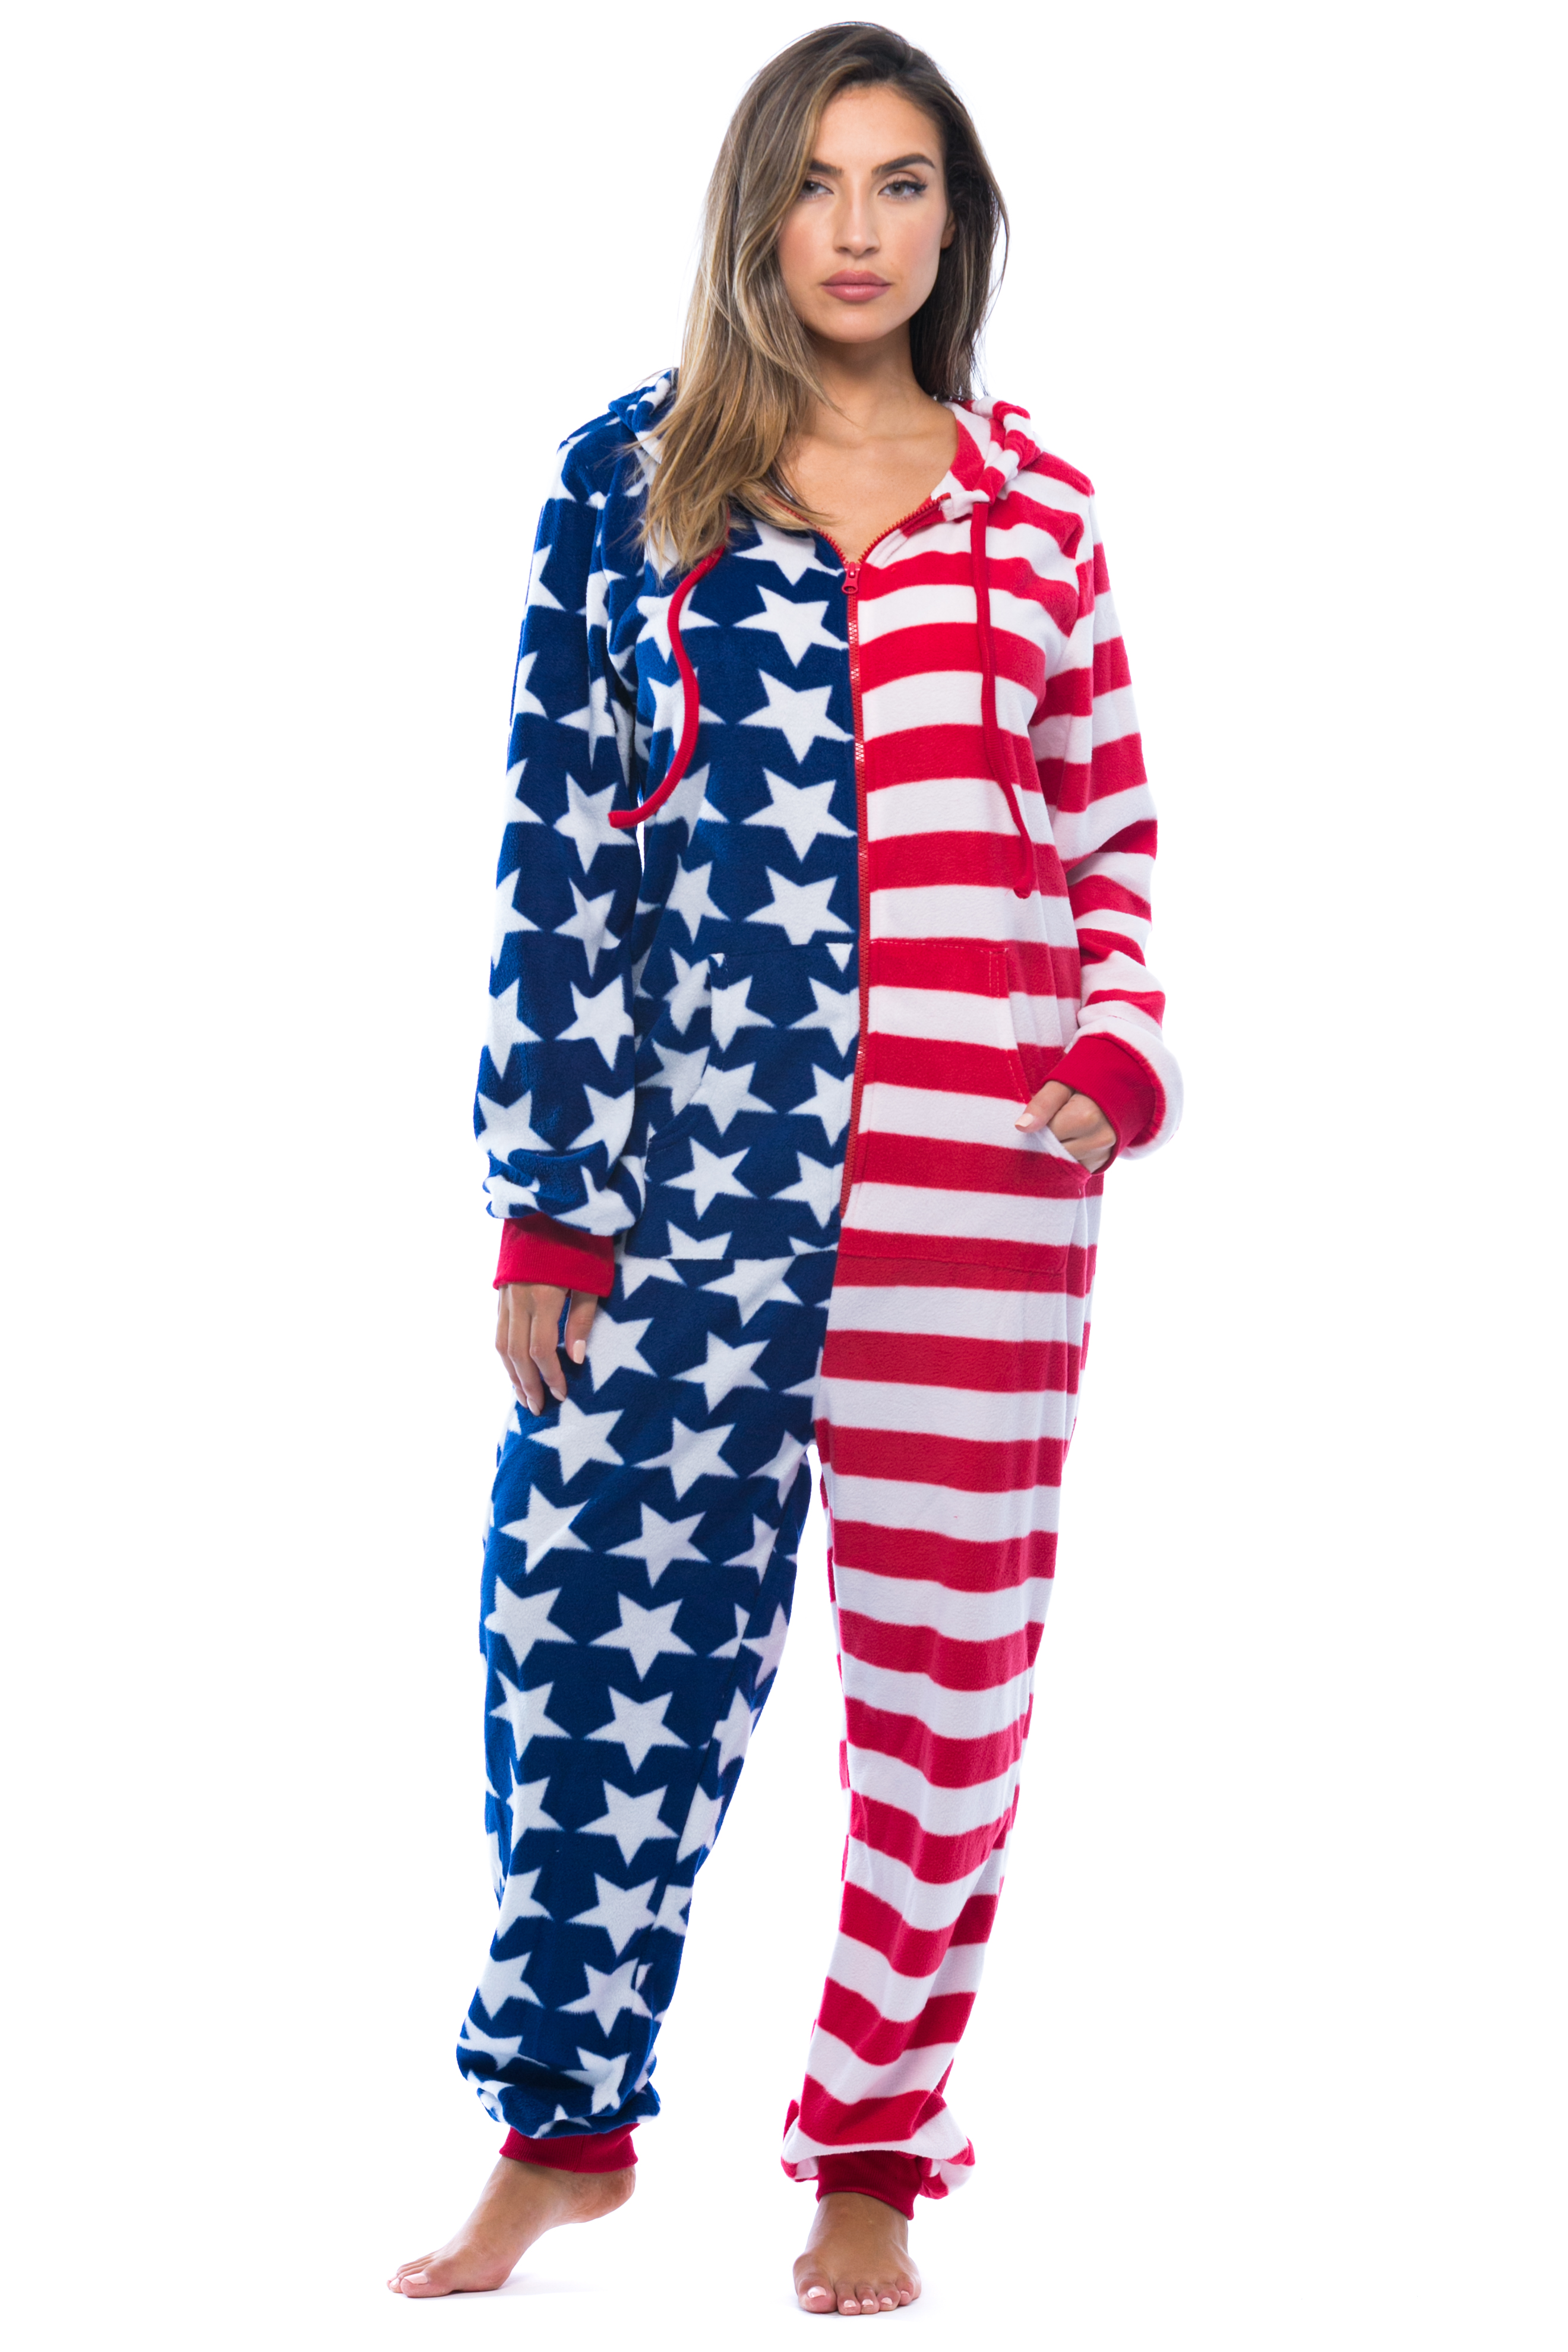 7029a9db3 FollowMe -  FollowMe American Flag Adult Onesie   Pajamas - Walmart.com